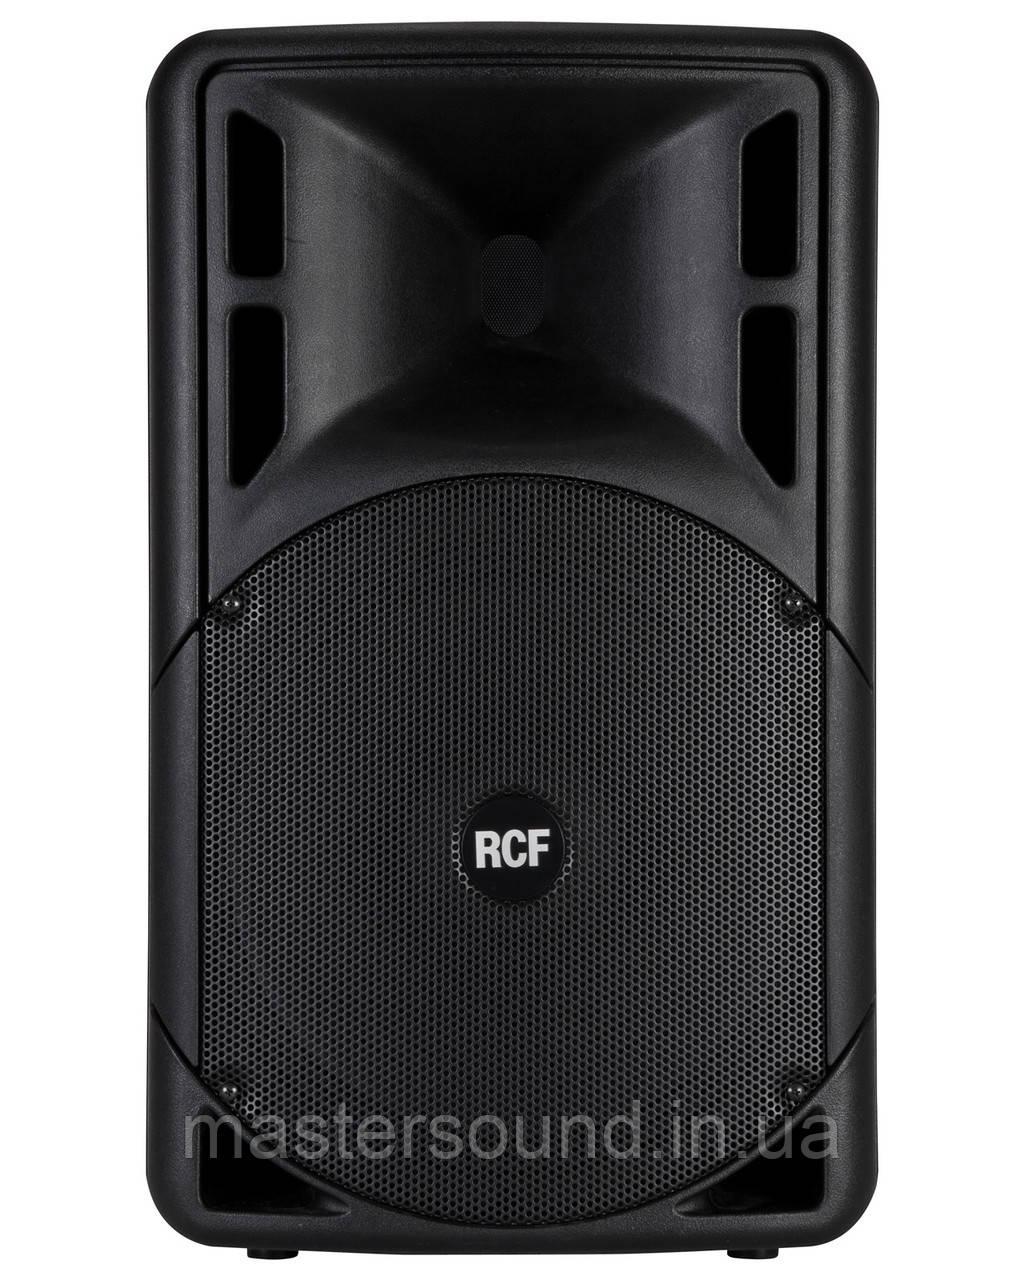 Активная акустическая система RCF ART 315 А MK4